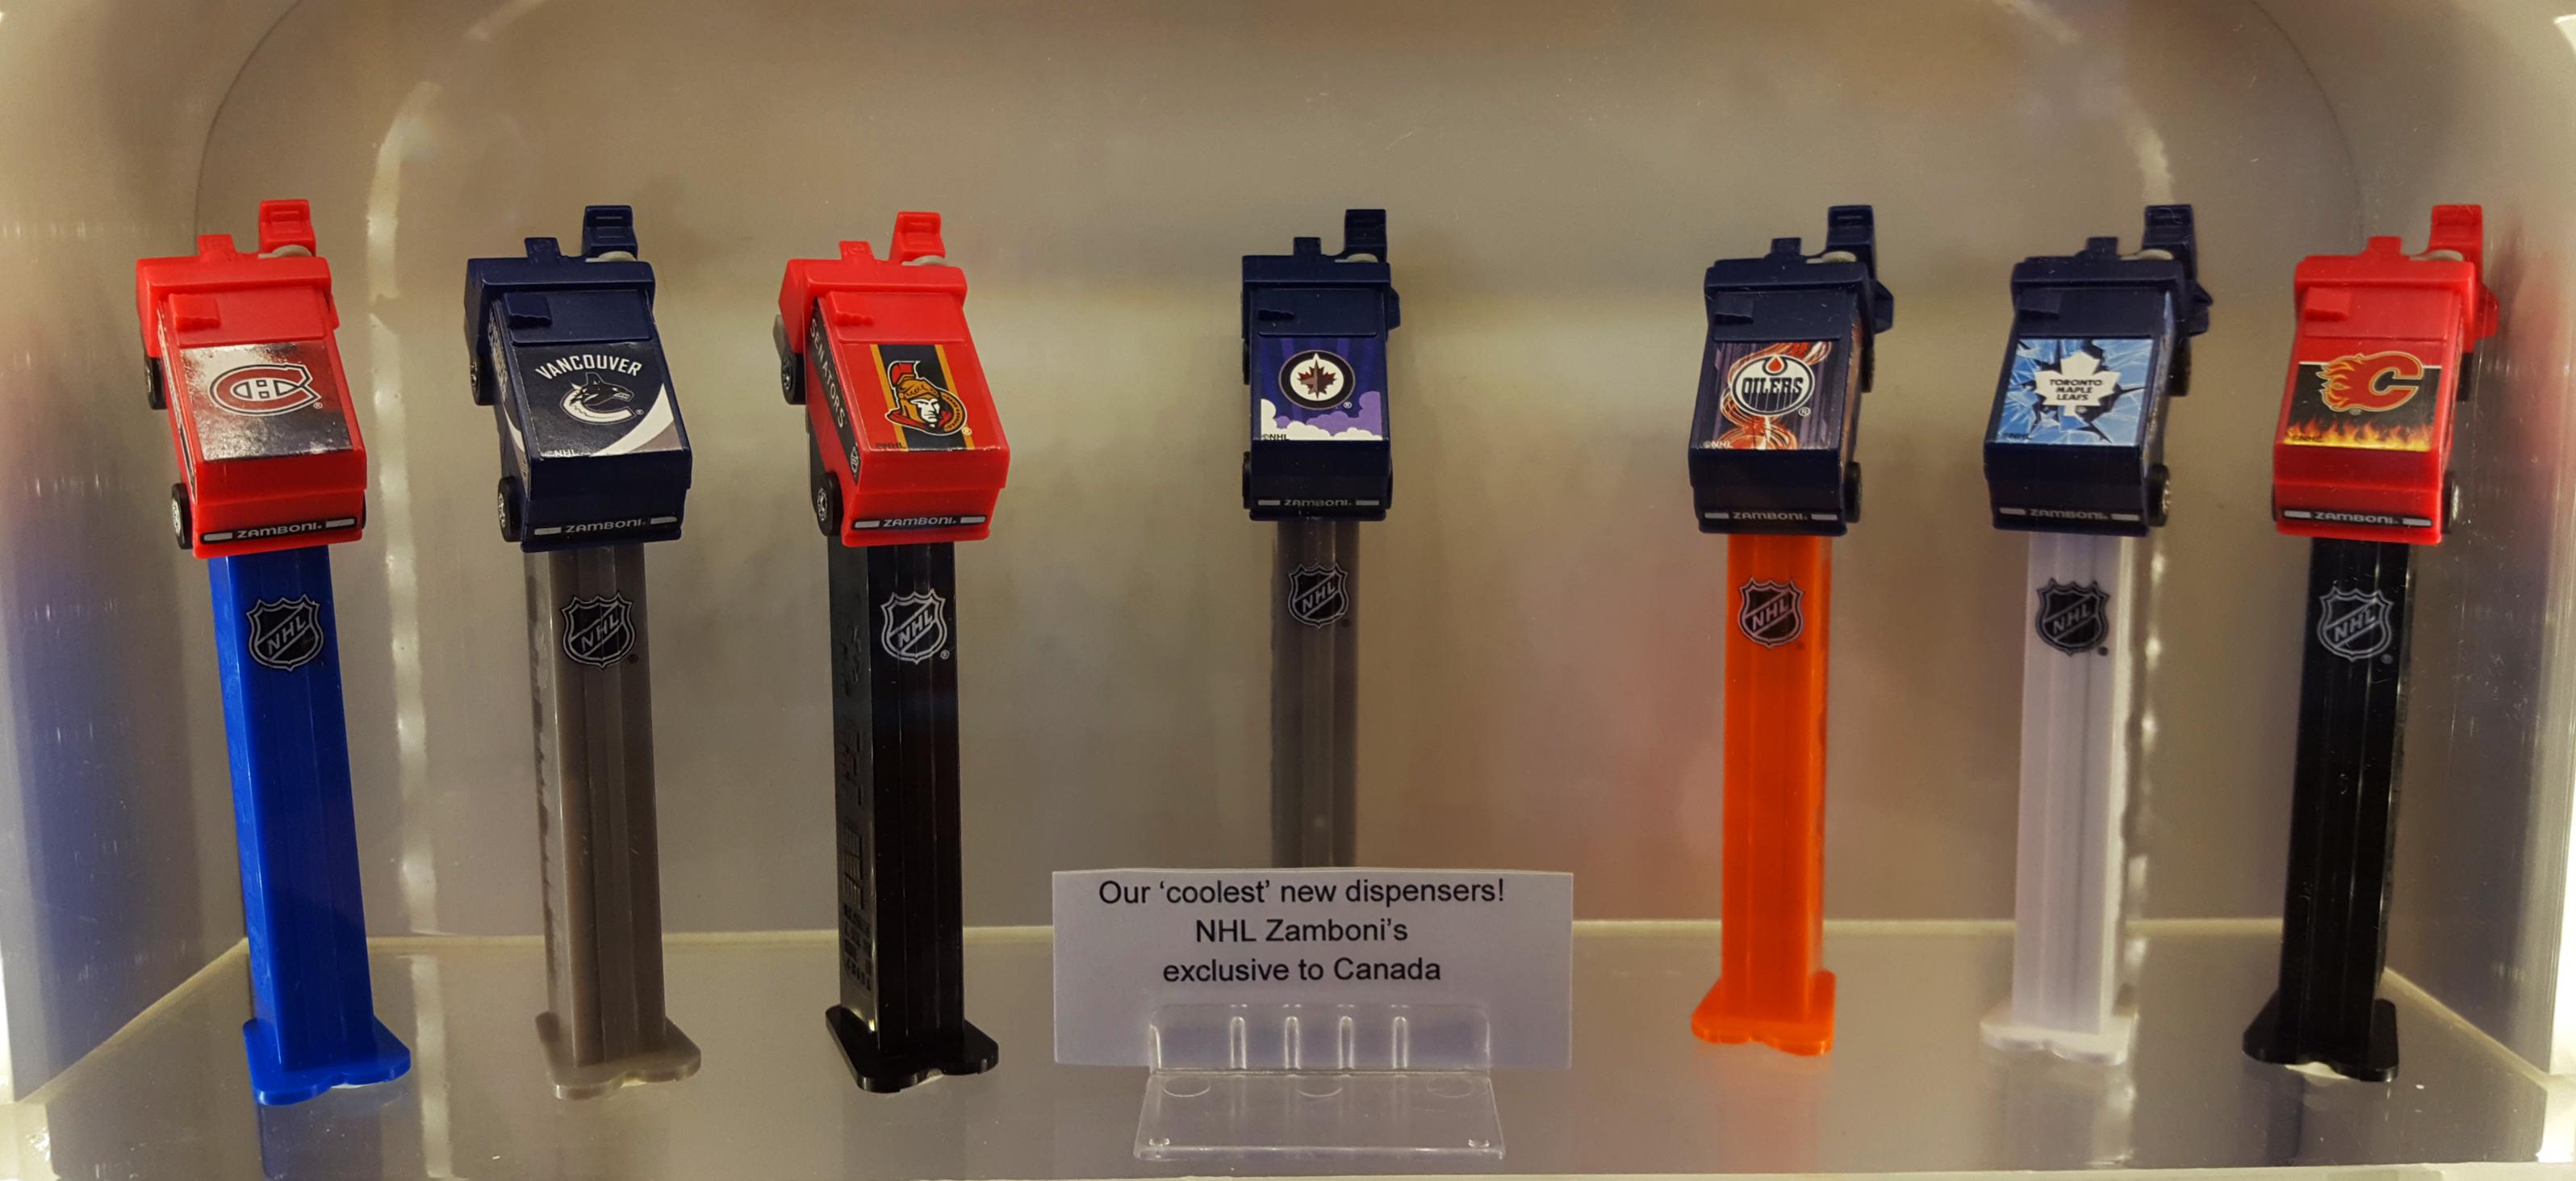 Zamboni Pez dispensers at the Pez Visitor Center in Orange, CT